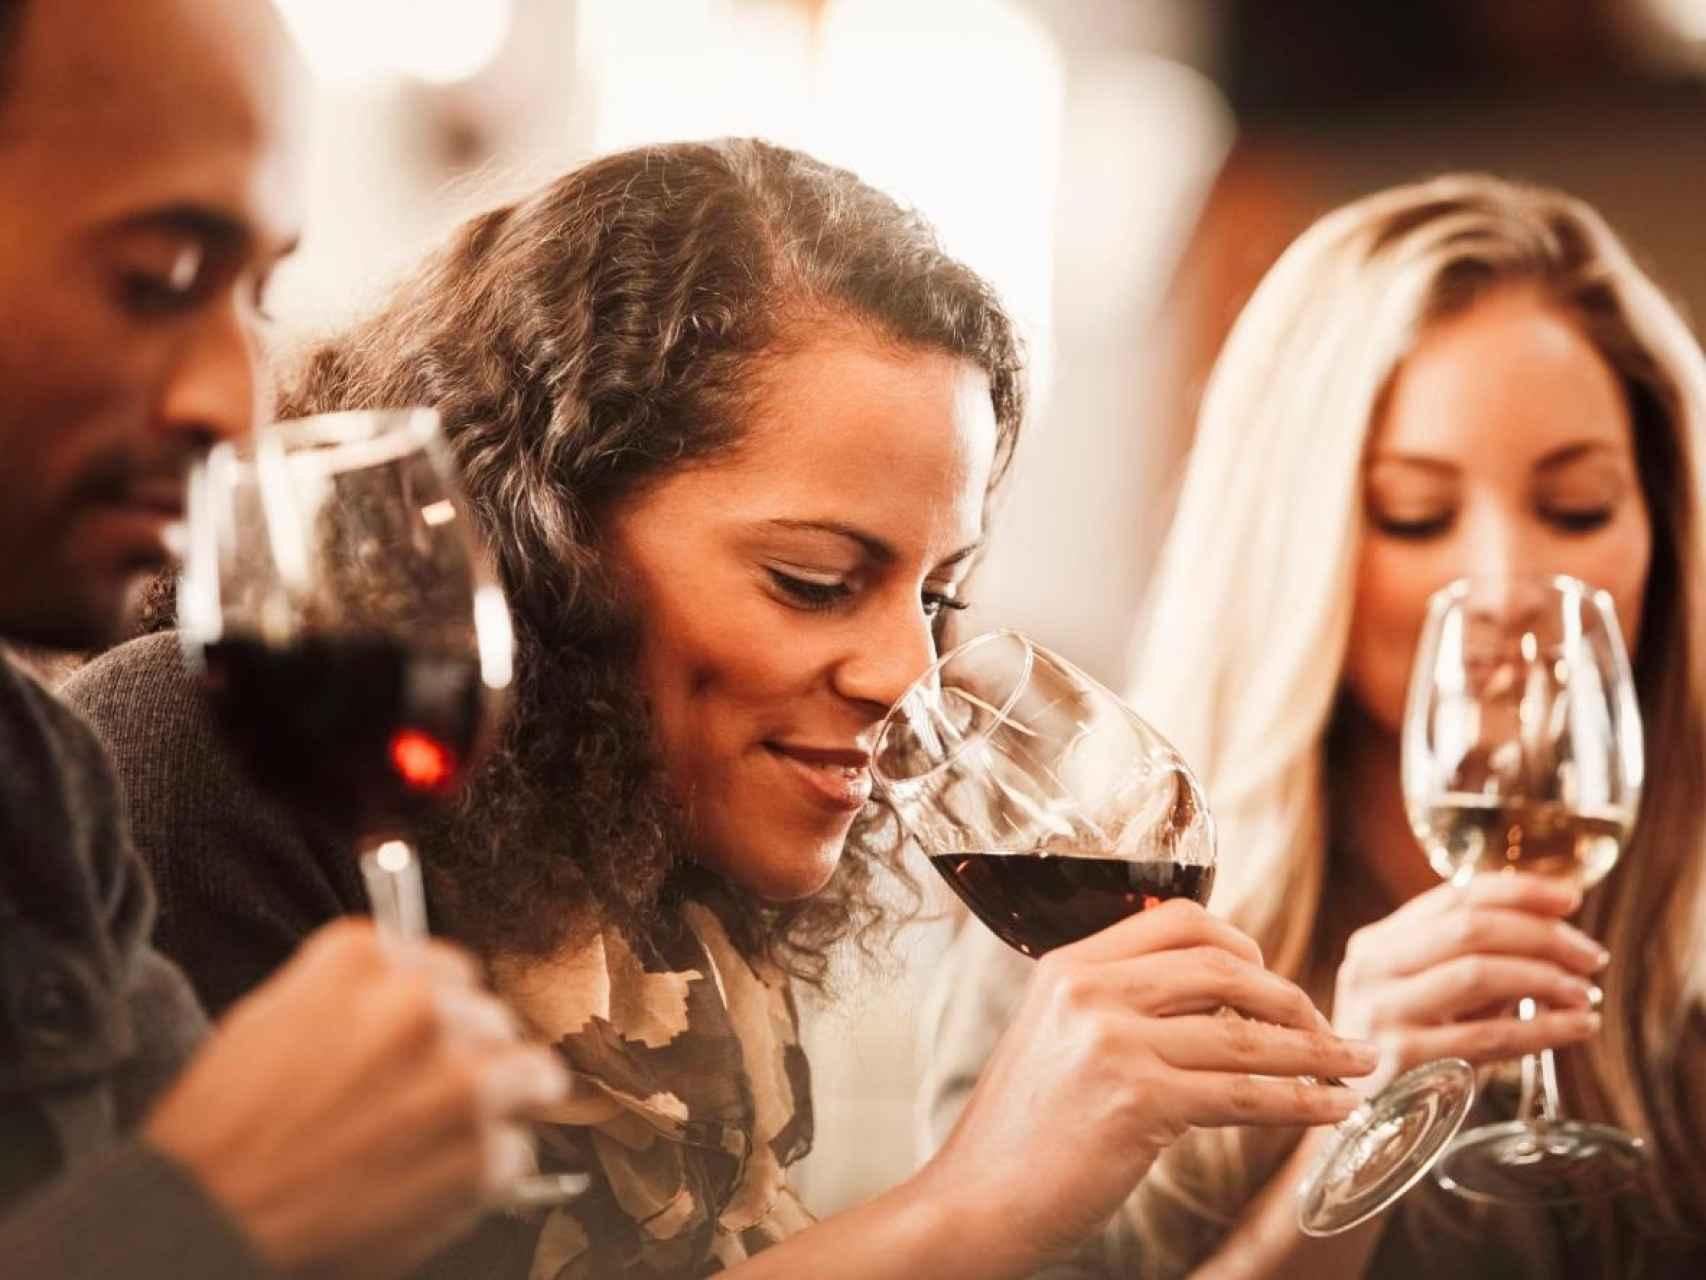 Para catar un vino no hace falta ser un experto.